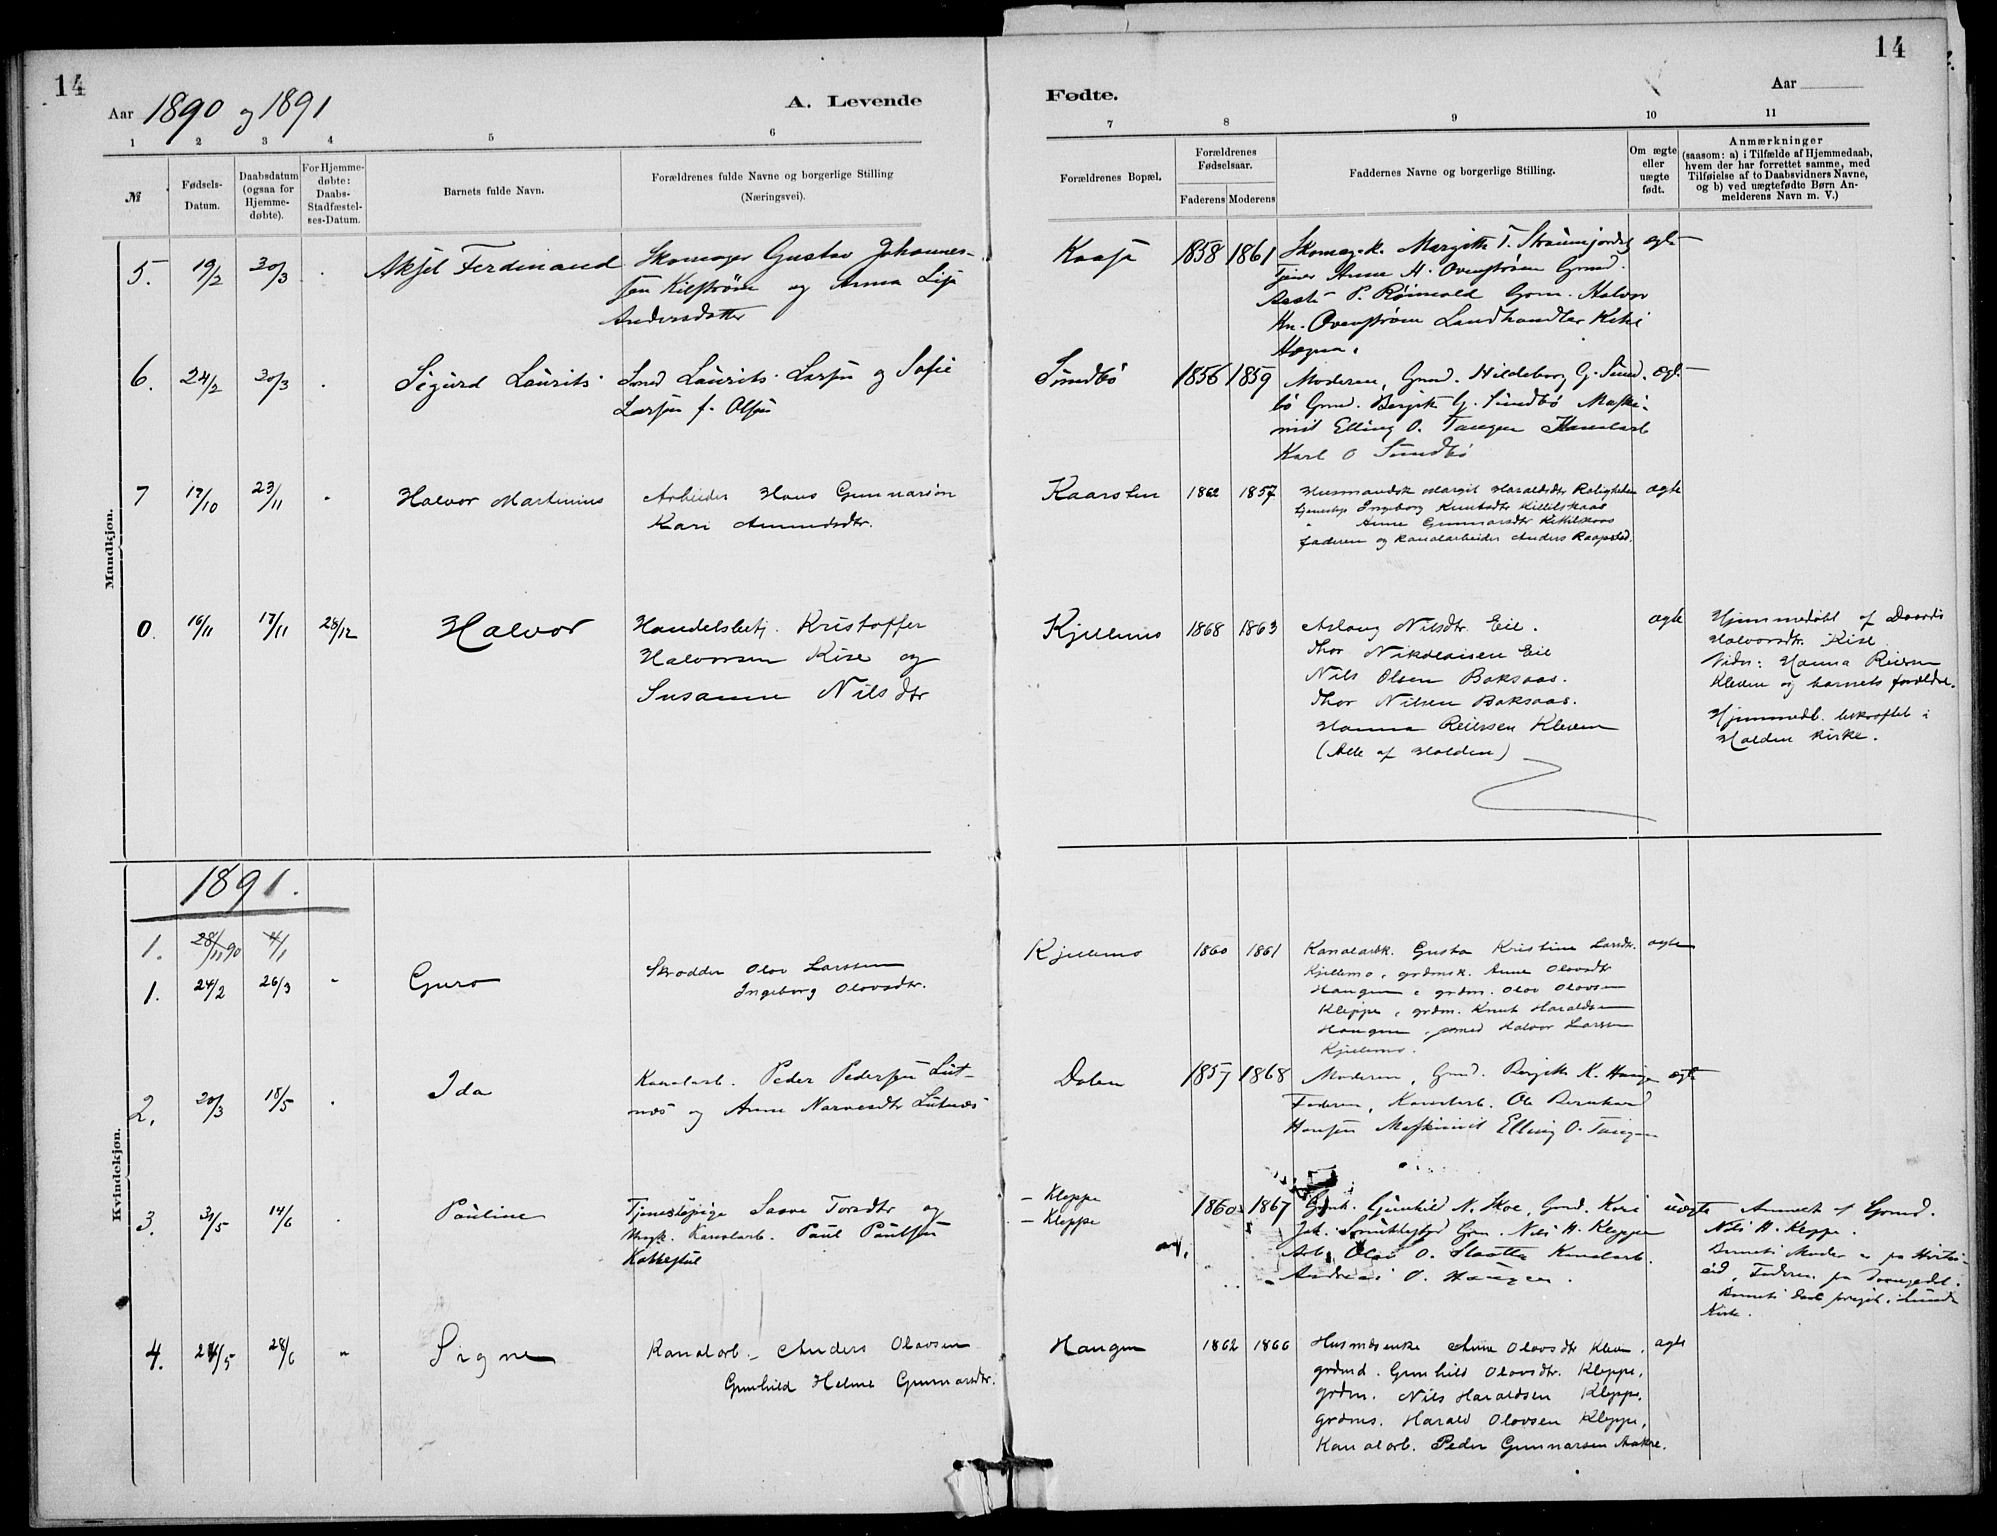 SAKO, Lunde kirkebøker, F/Fb/L0003: Ministerialbok nr. II 3, 1882-1891, s. 14